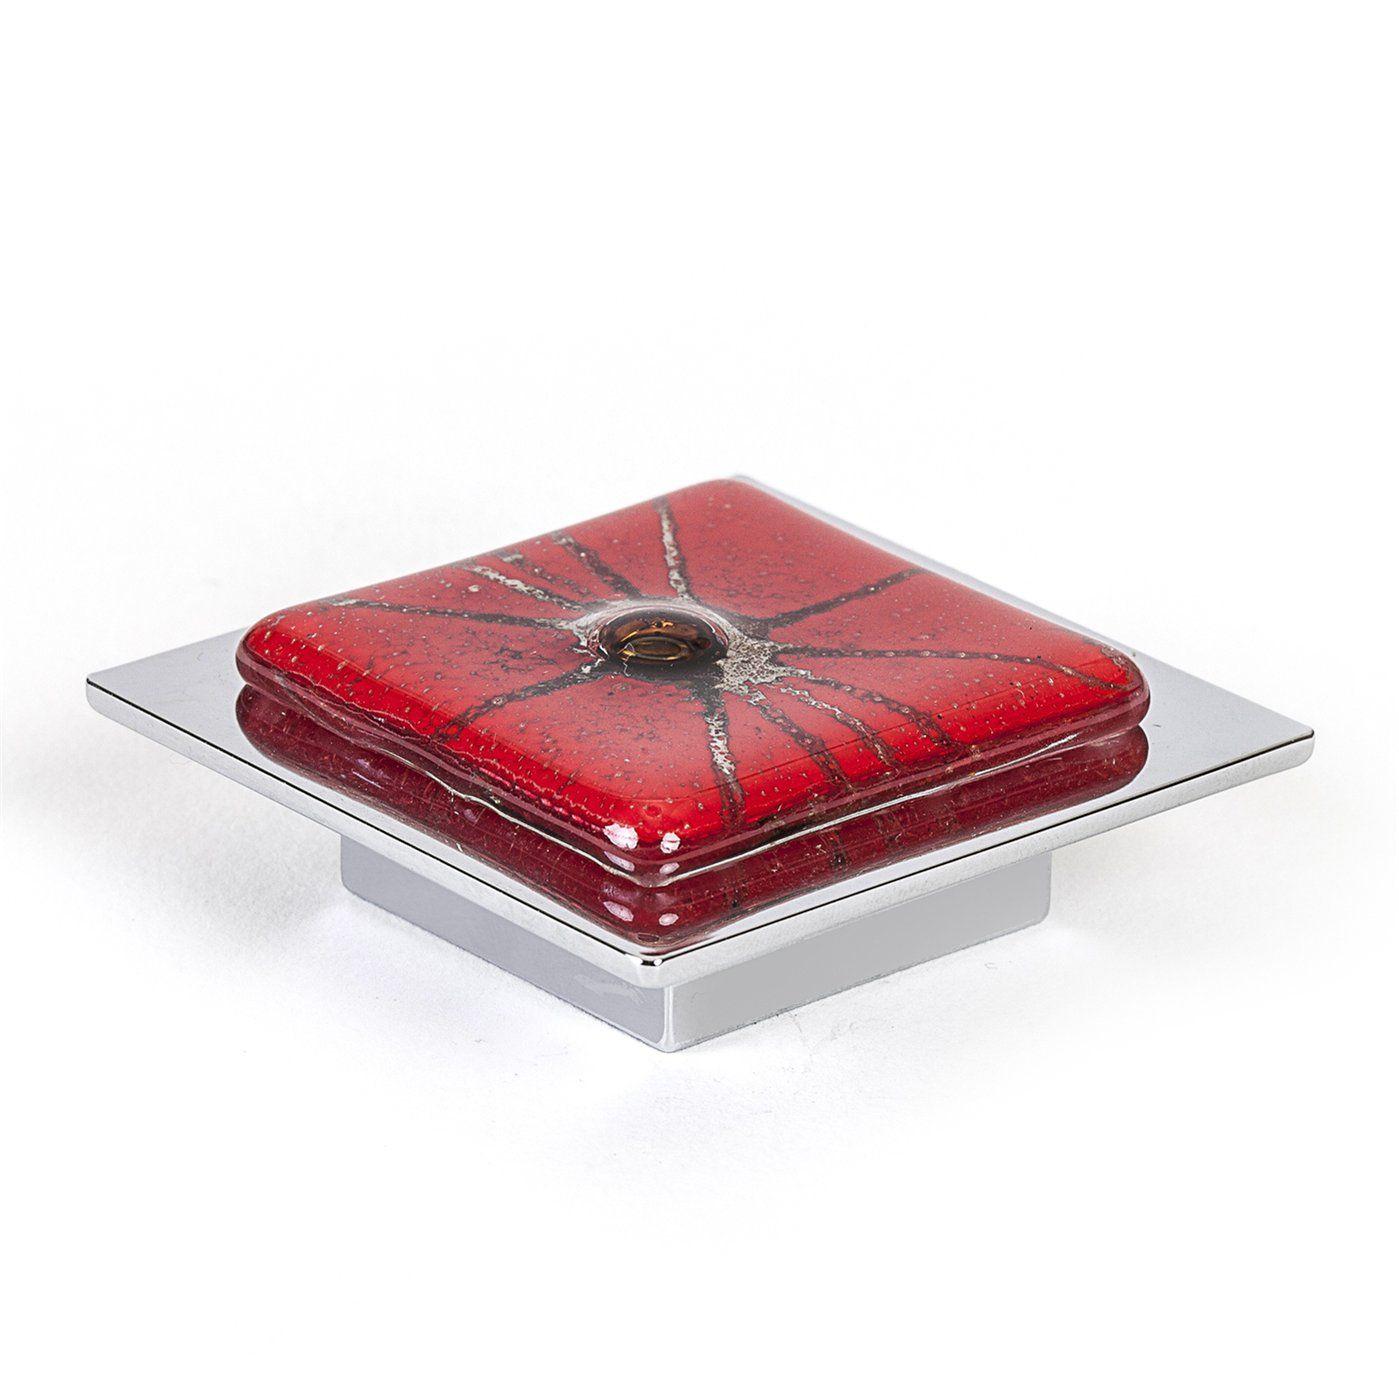 R Christensen 9675 1000 C Radiants Red Cabinet Knob - Atg Stores